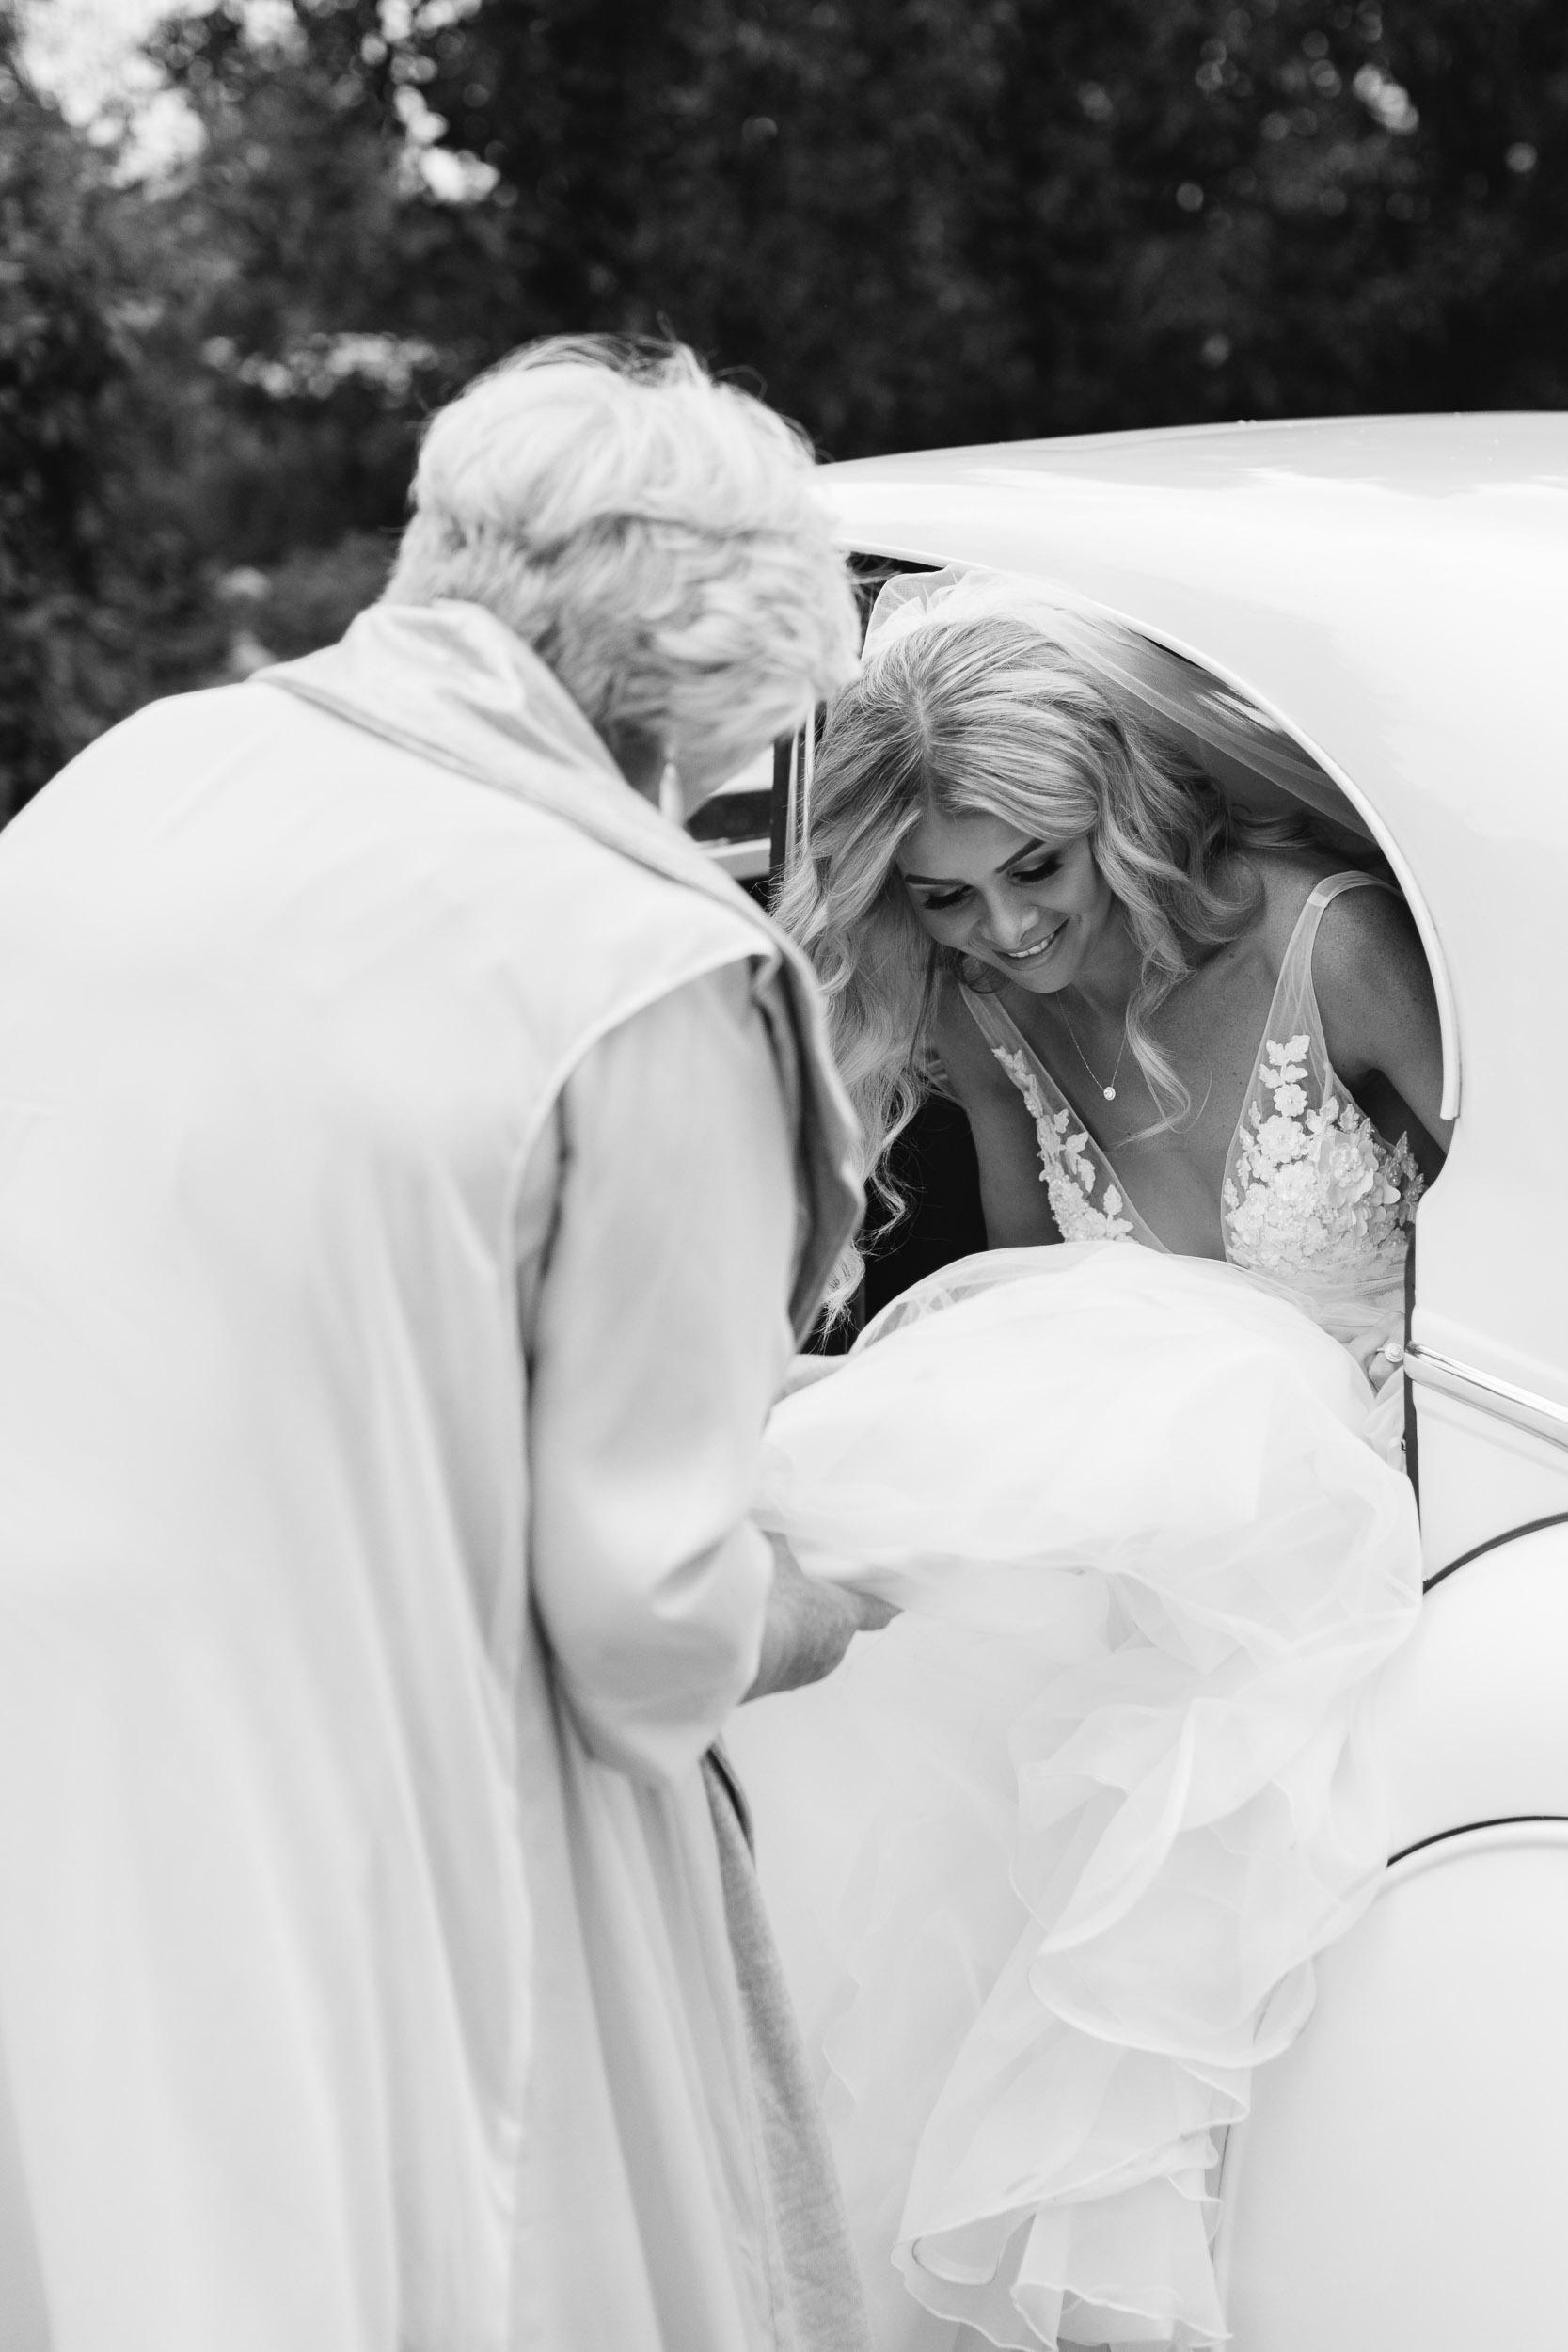 Kas-Richards-Mornington-Peninsula-Private-Property-Wedding-Marianna-Hardwick-Gown-184.jpg